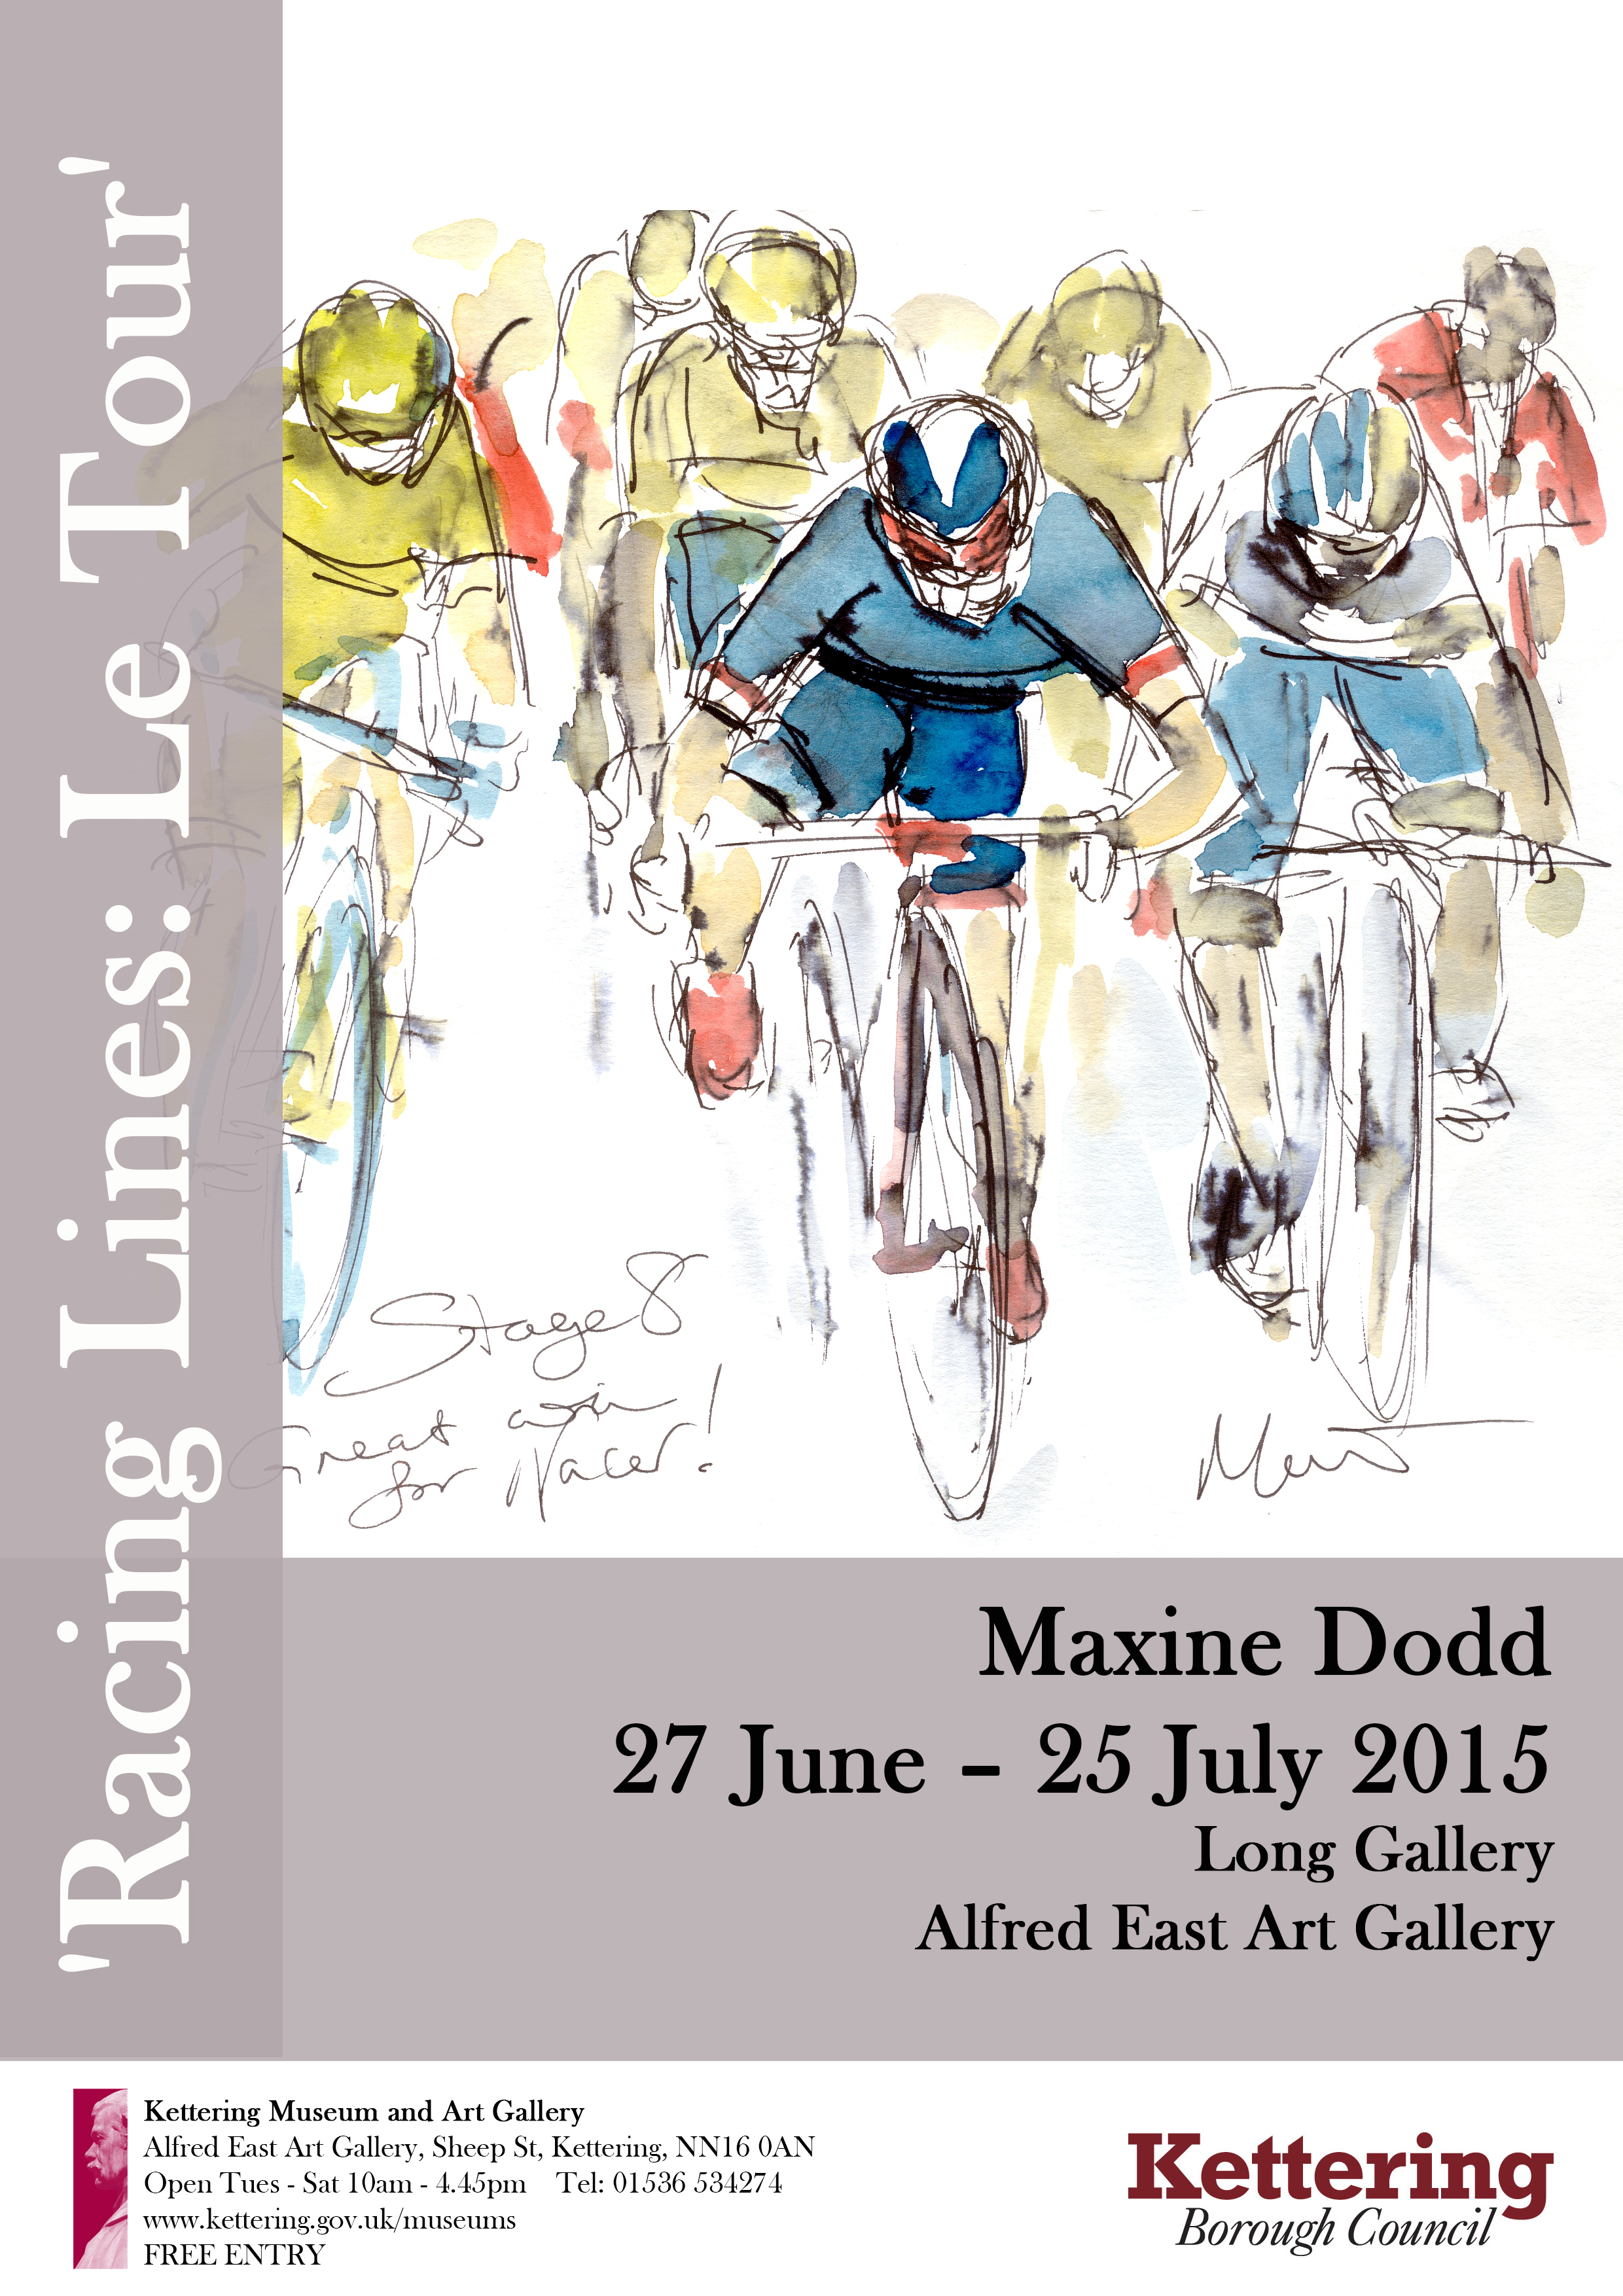 Maxine Dodd 'Racing Lines: Le Tour' Exhibtion